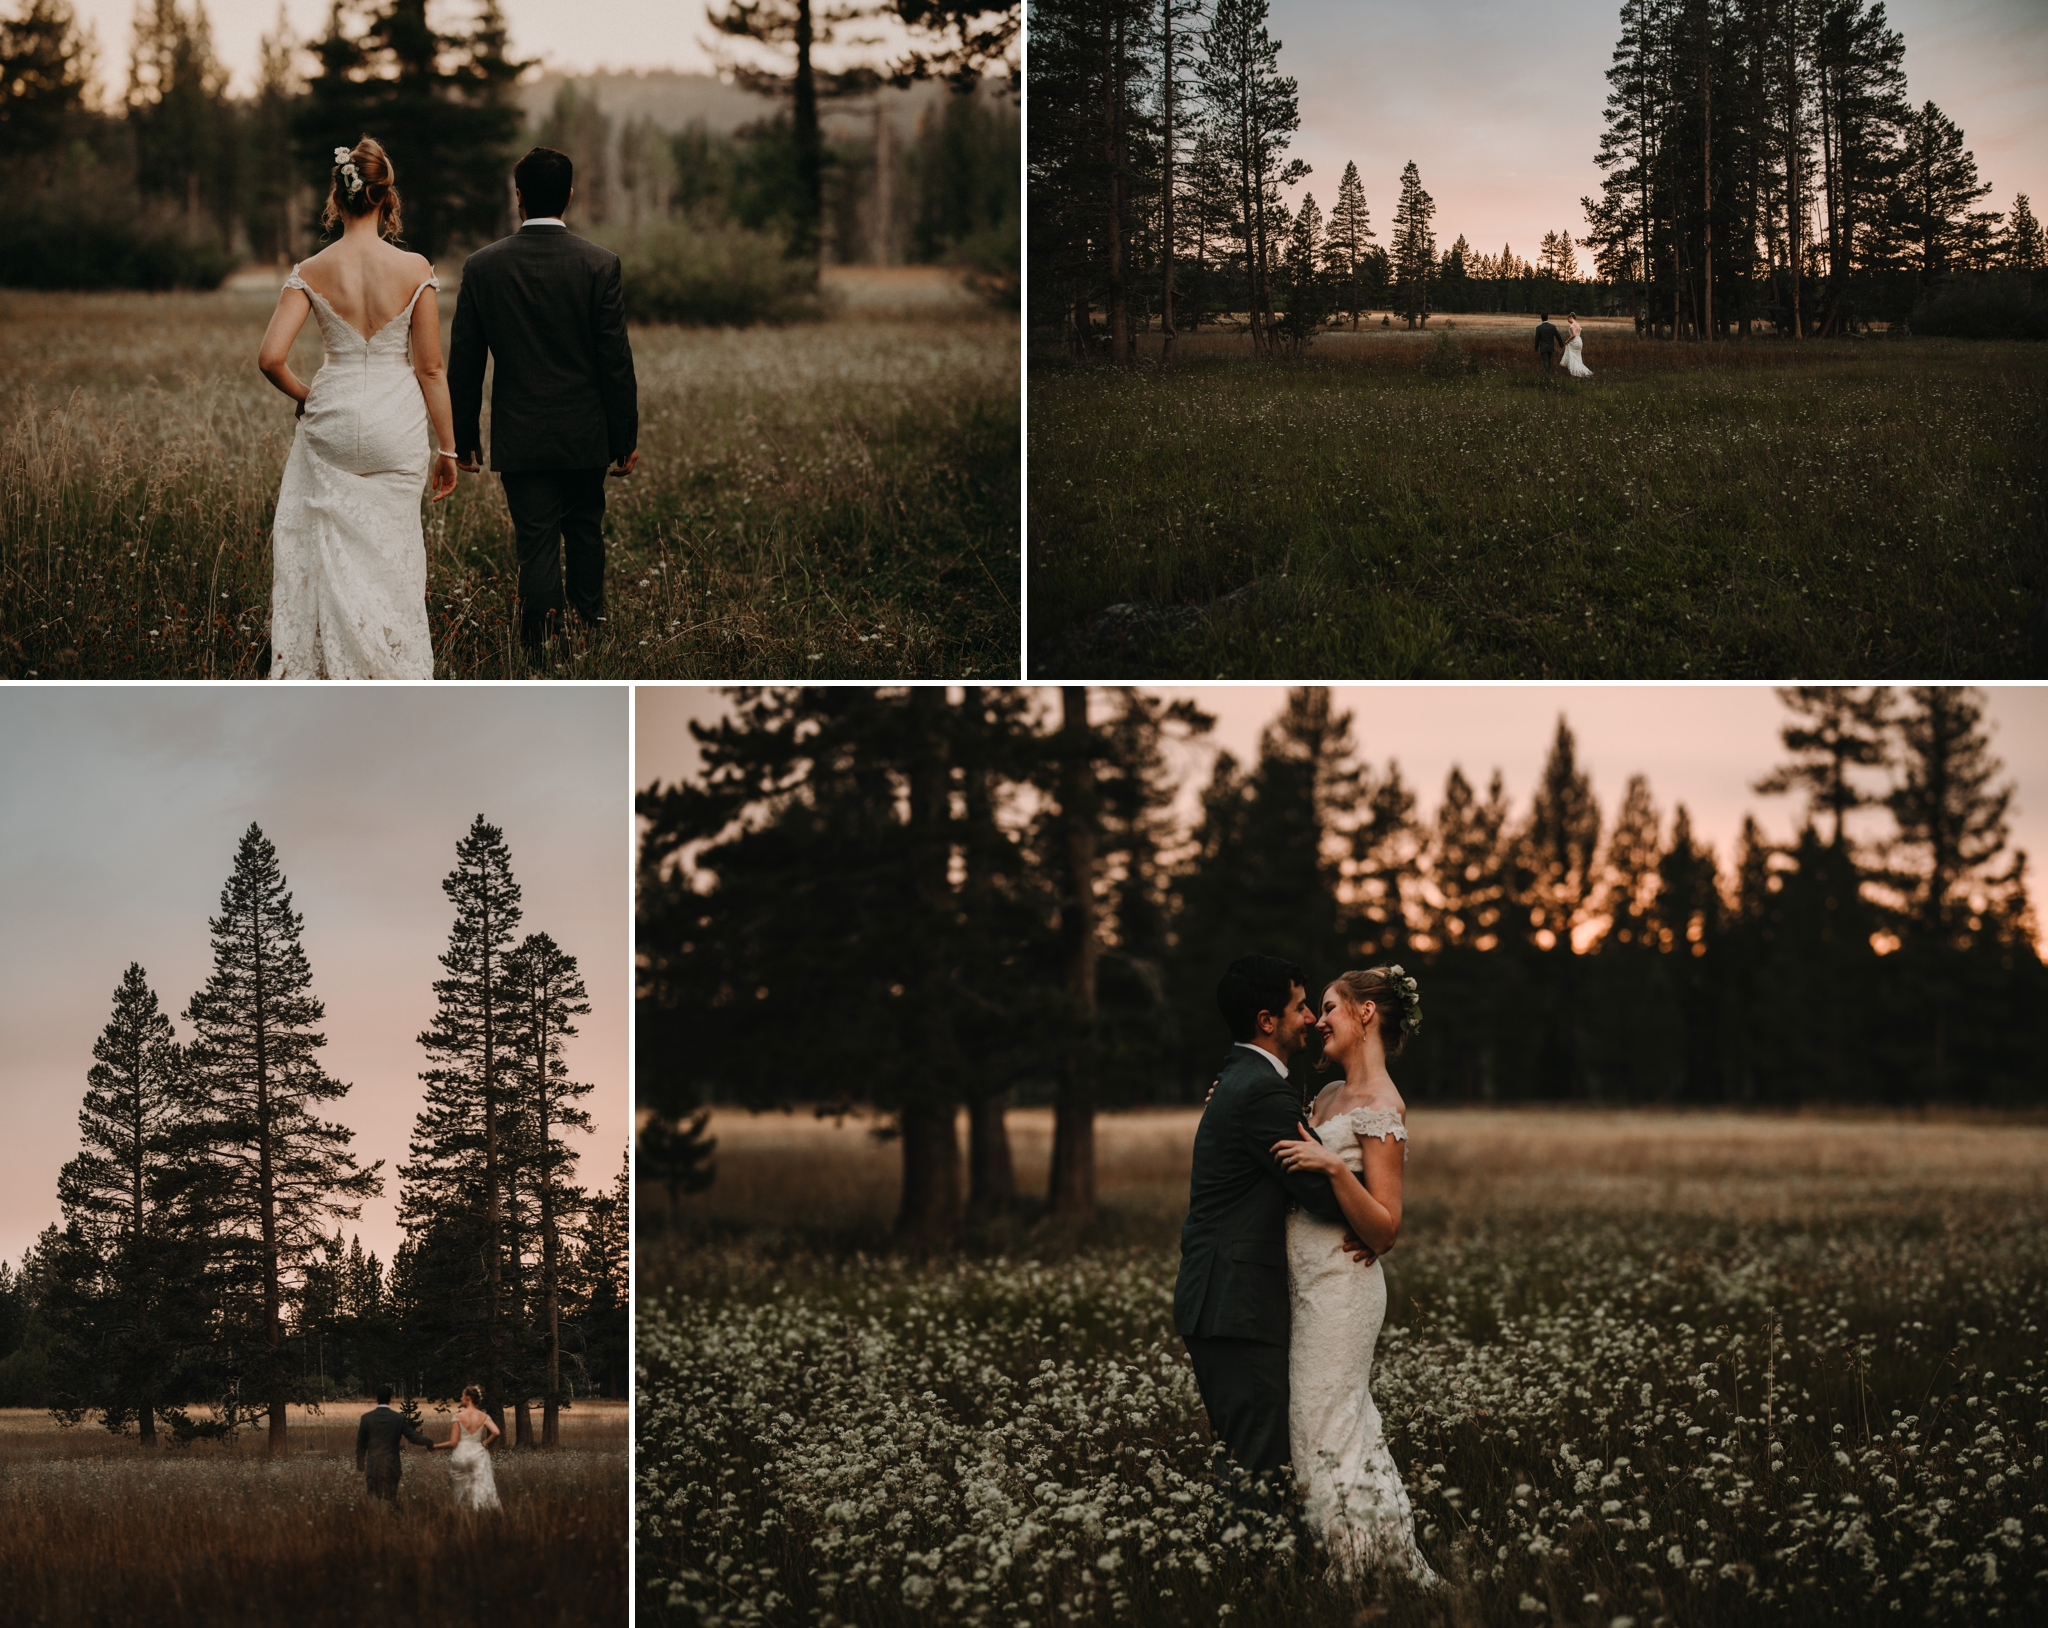 tahoe-wedding-photographer12.jpg